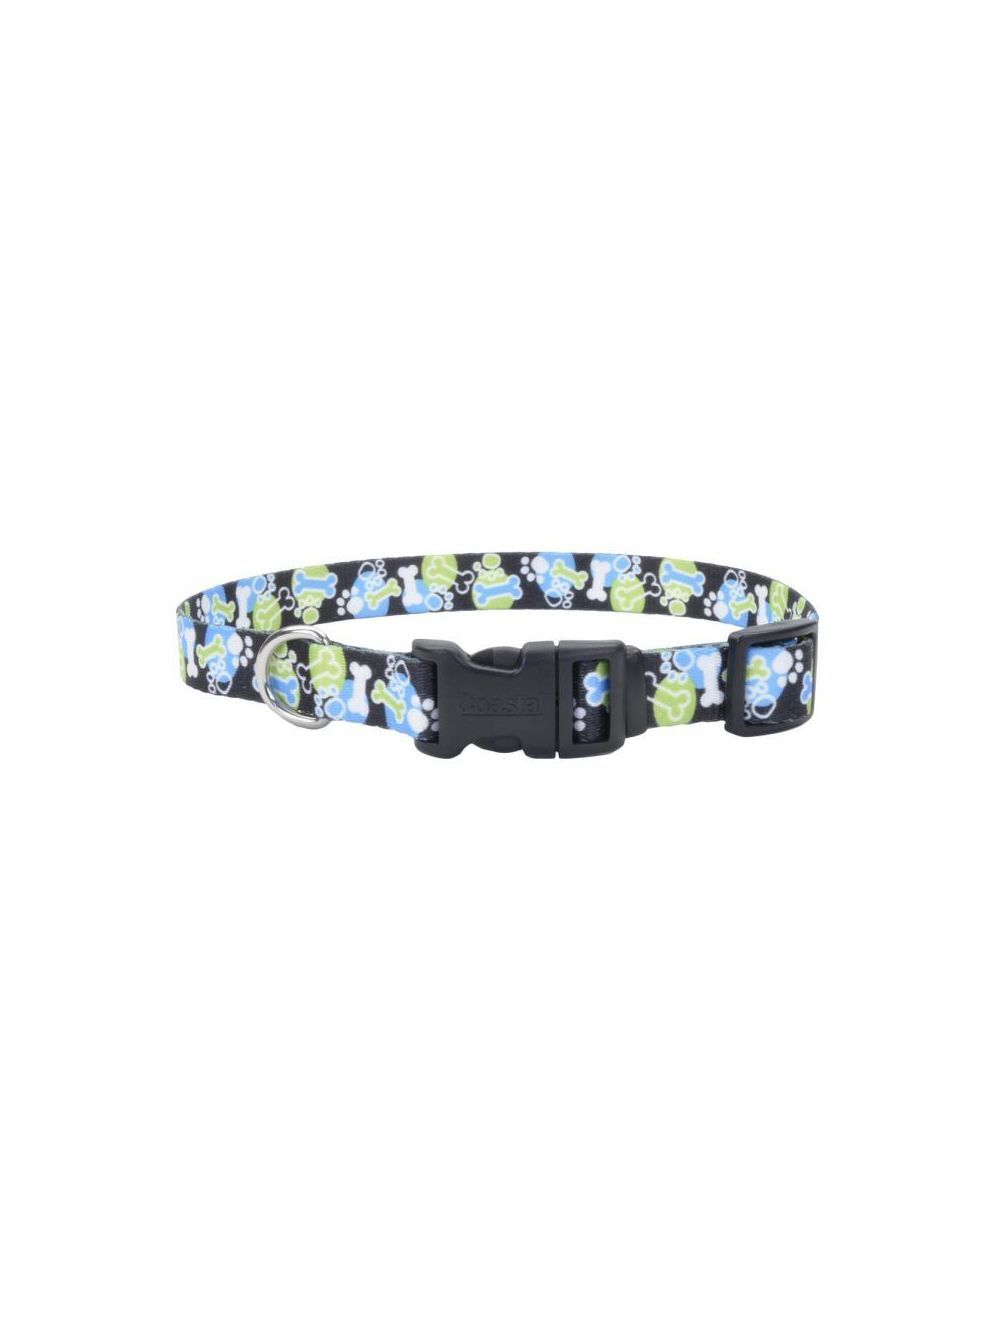 Coastal perro styles hueso huella azul collar x-small 3/8